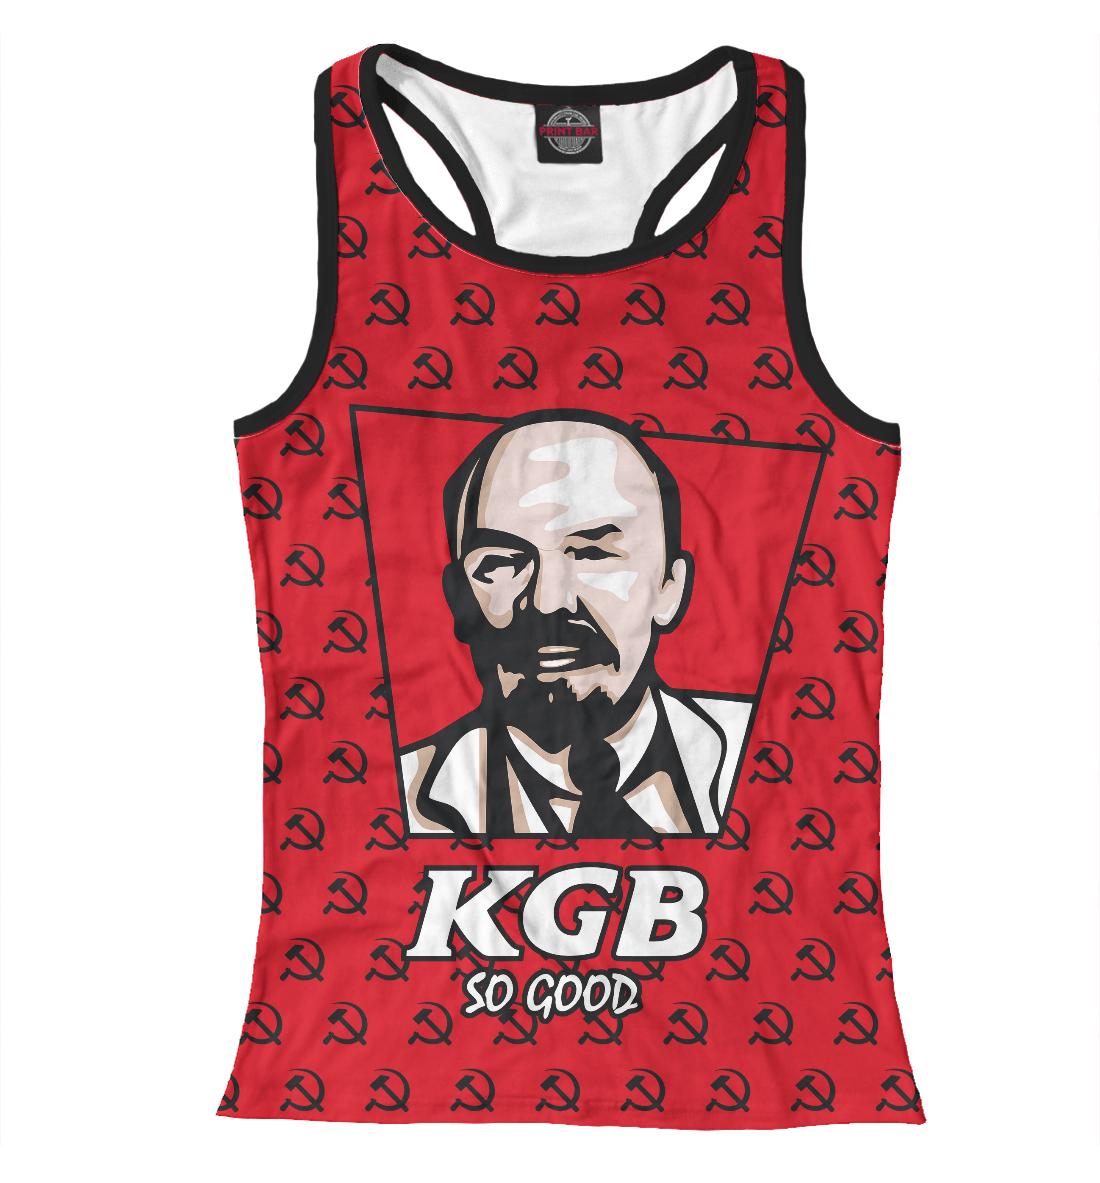 Купить KGB So Good, Printbar, Майки борцовки, SSS-736766-mayb-1